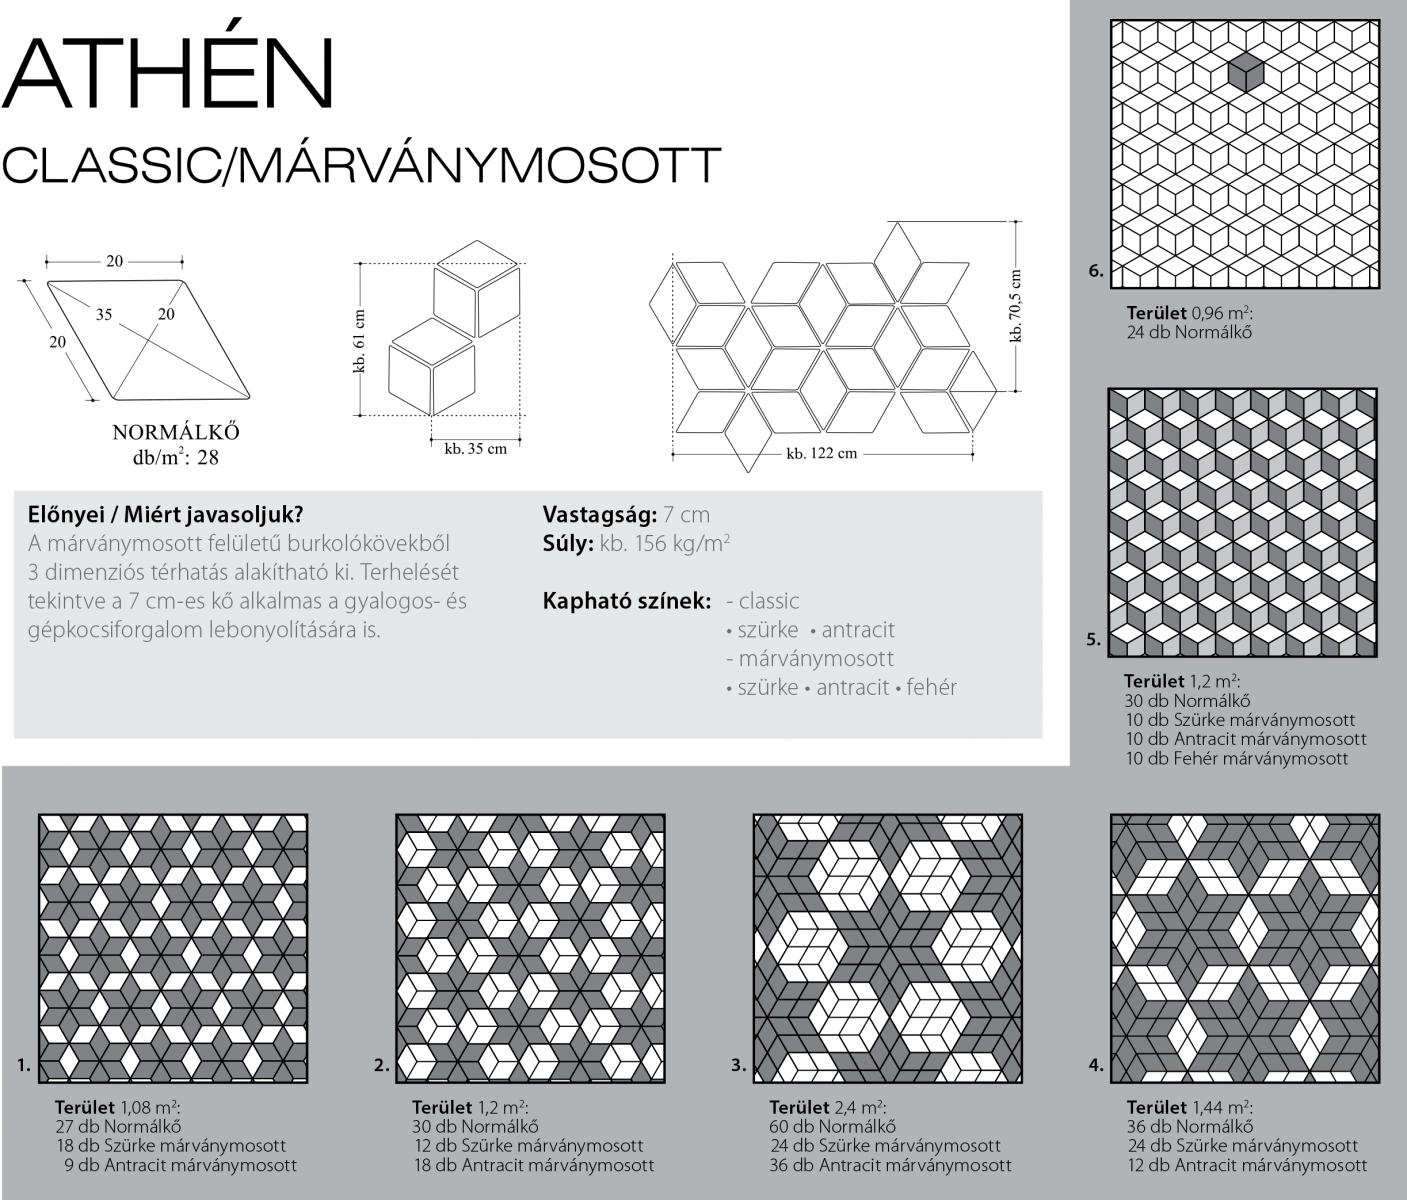 Athén technikai információi